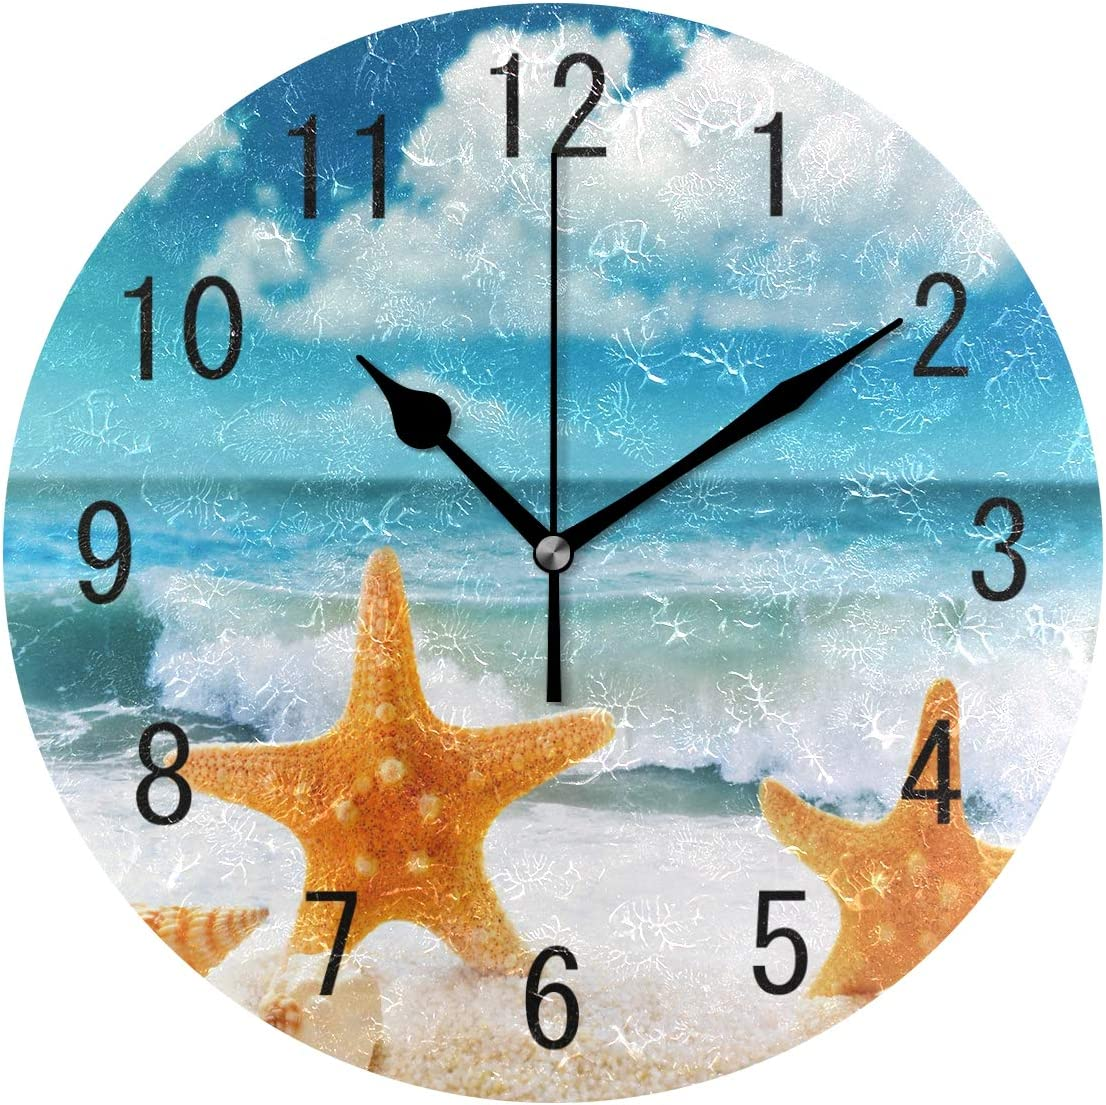 ALAZA Home Decor Seashell Starfish Sea Wave Ocean Round Acrylic 9.5 Inch Wall Clock Non Ticking Silent Clock Art for Living Room Kitchen Bedroom